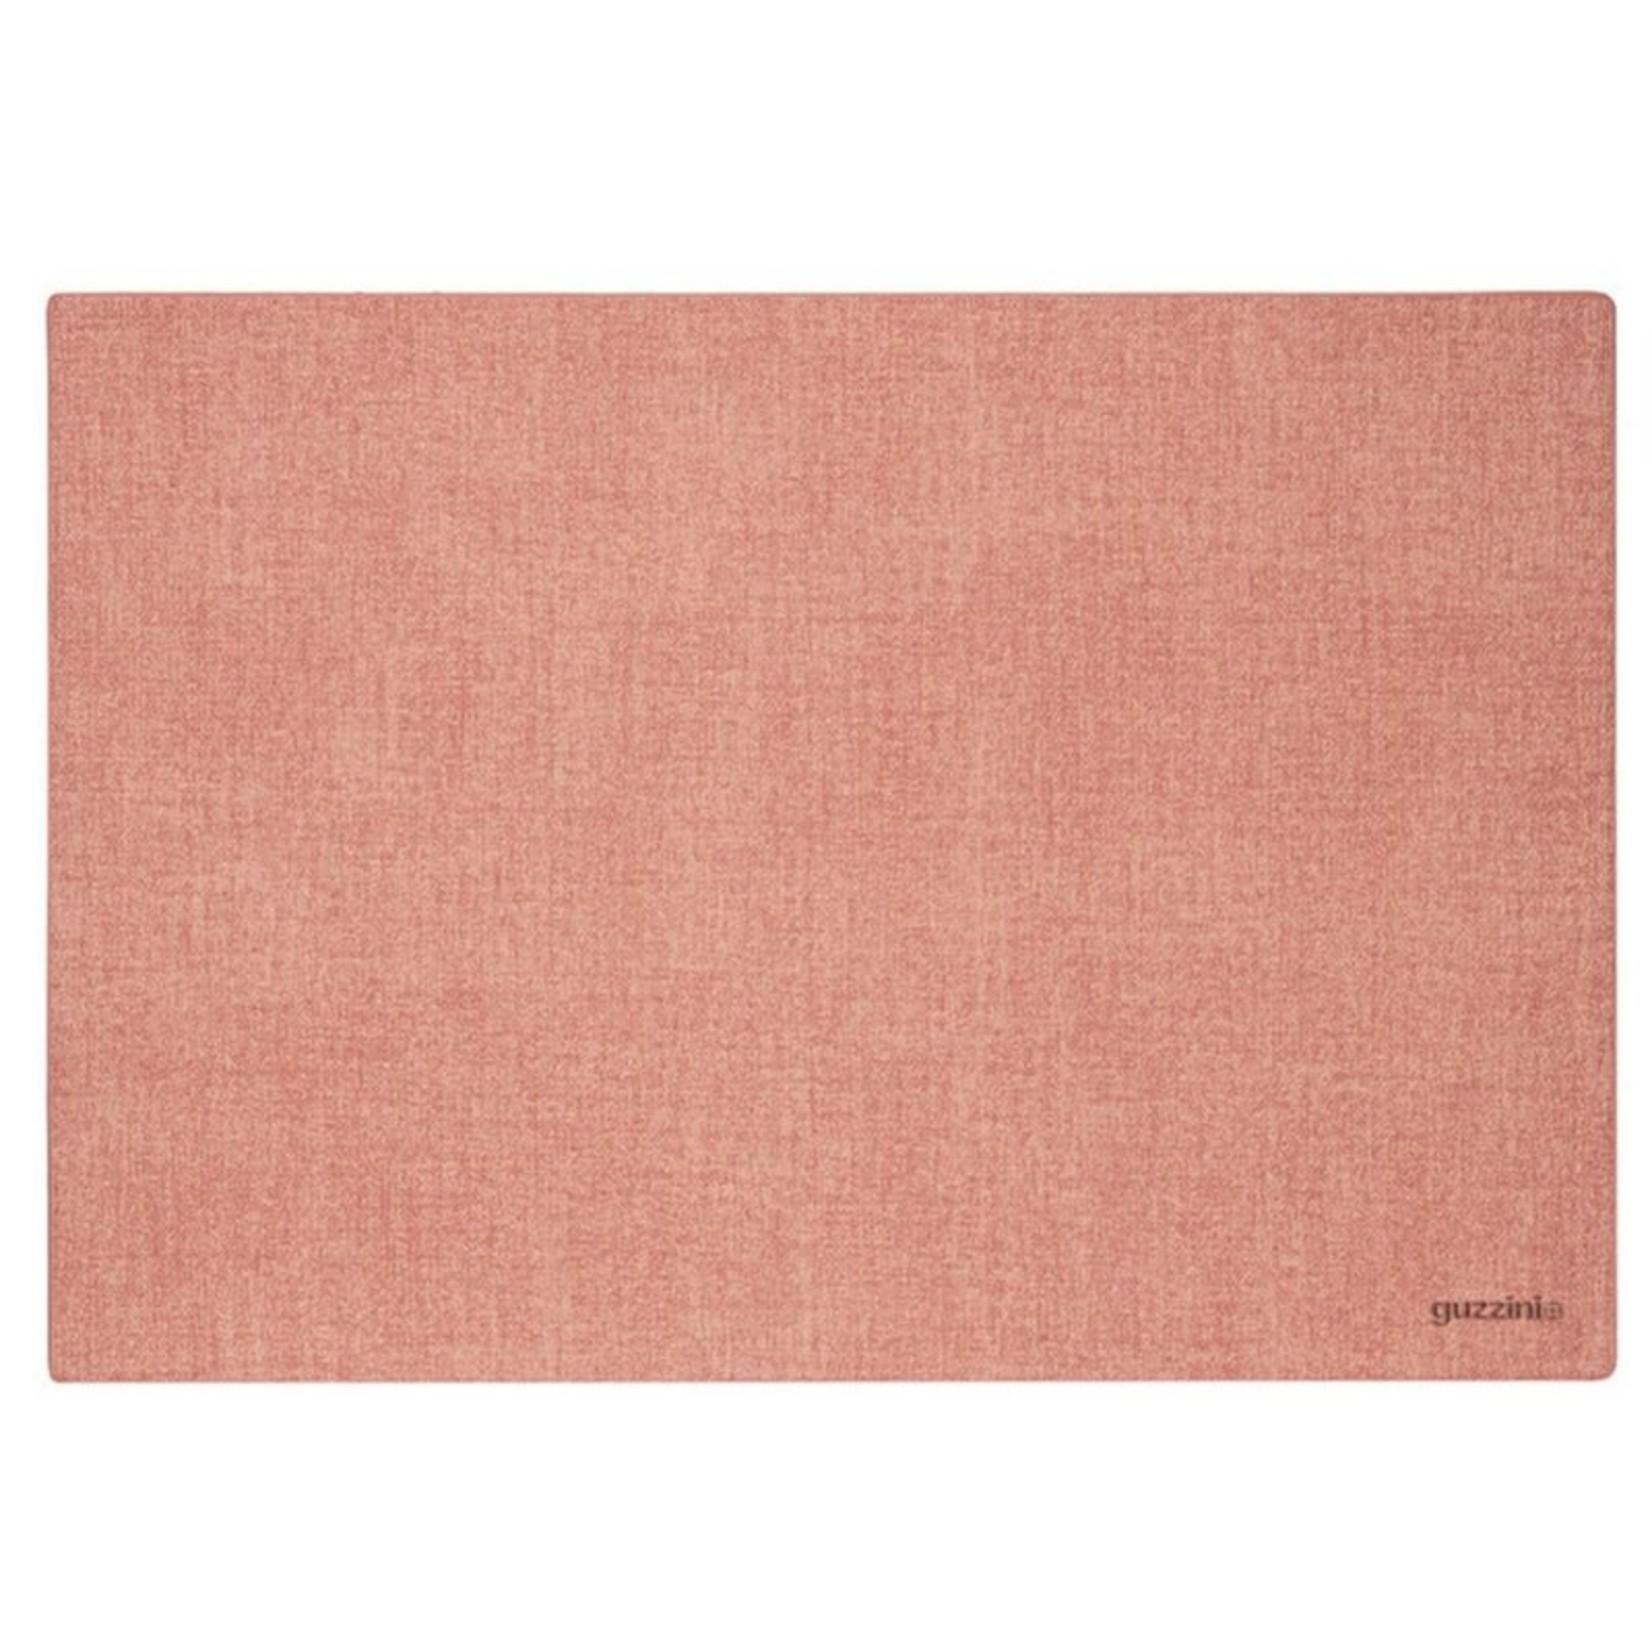 *Guzzini Fabric Reversible Placemat Tiffany - Pink - Final Sale